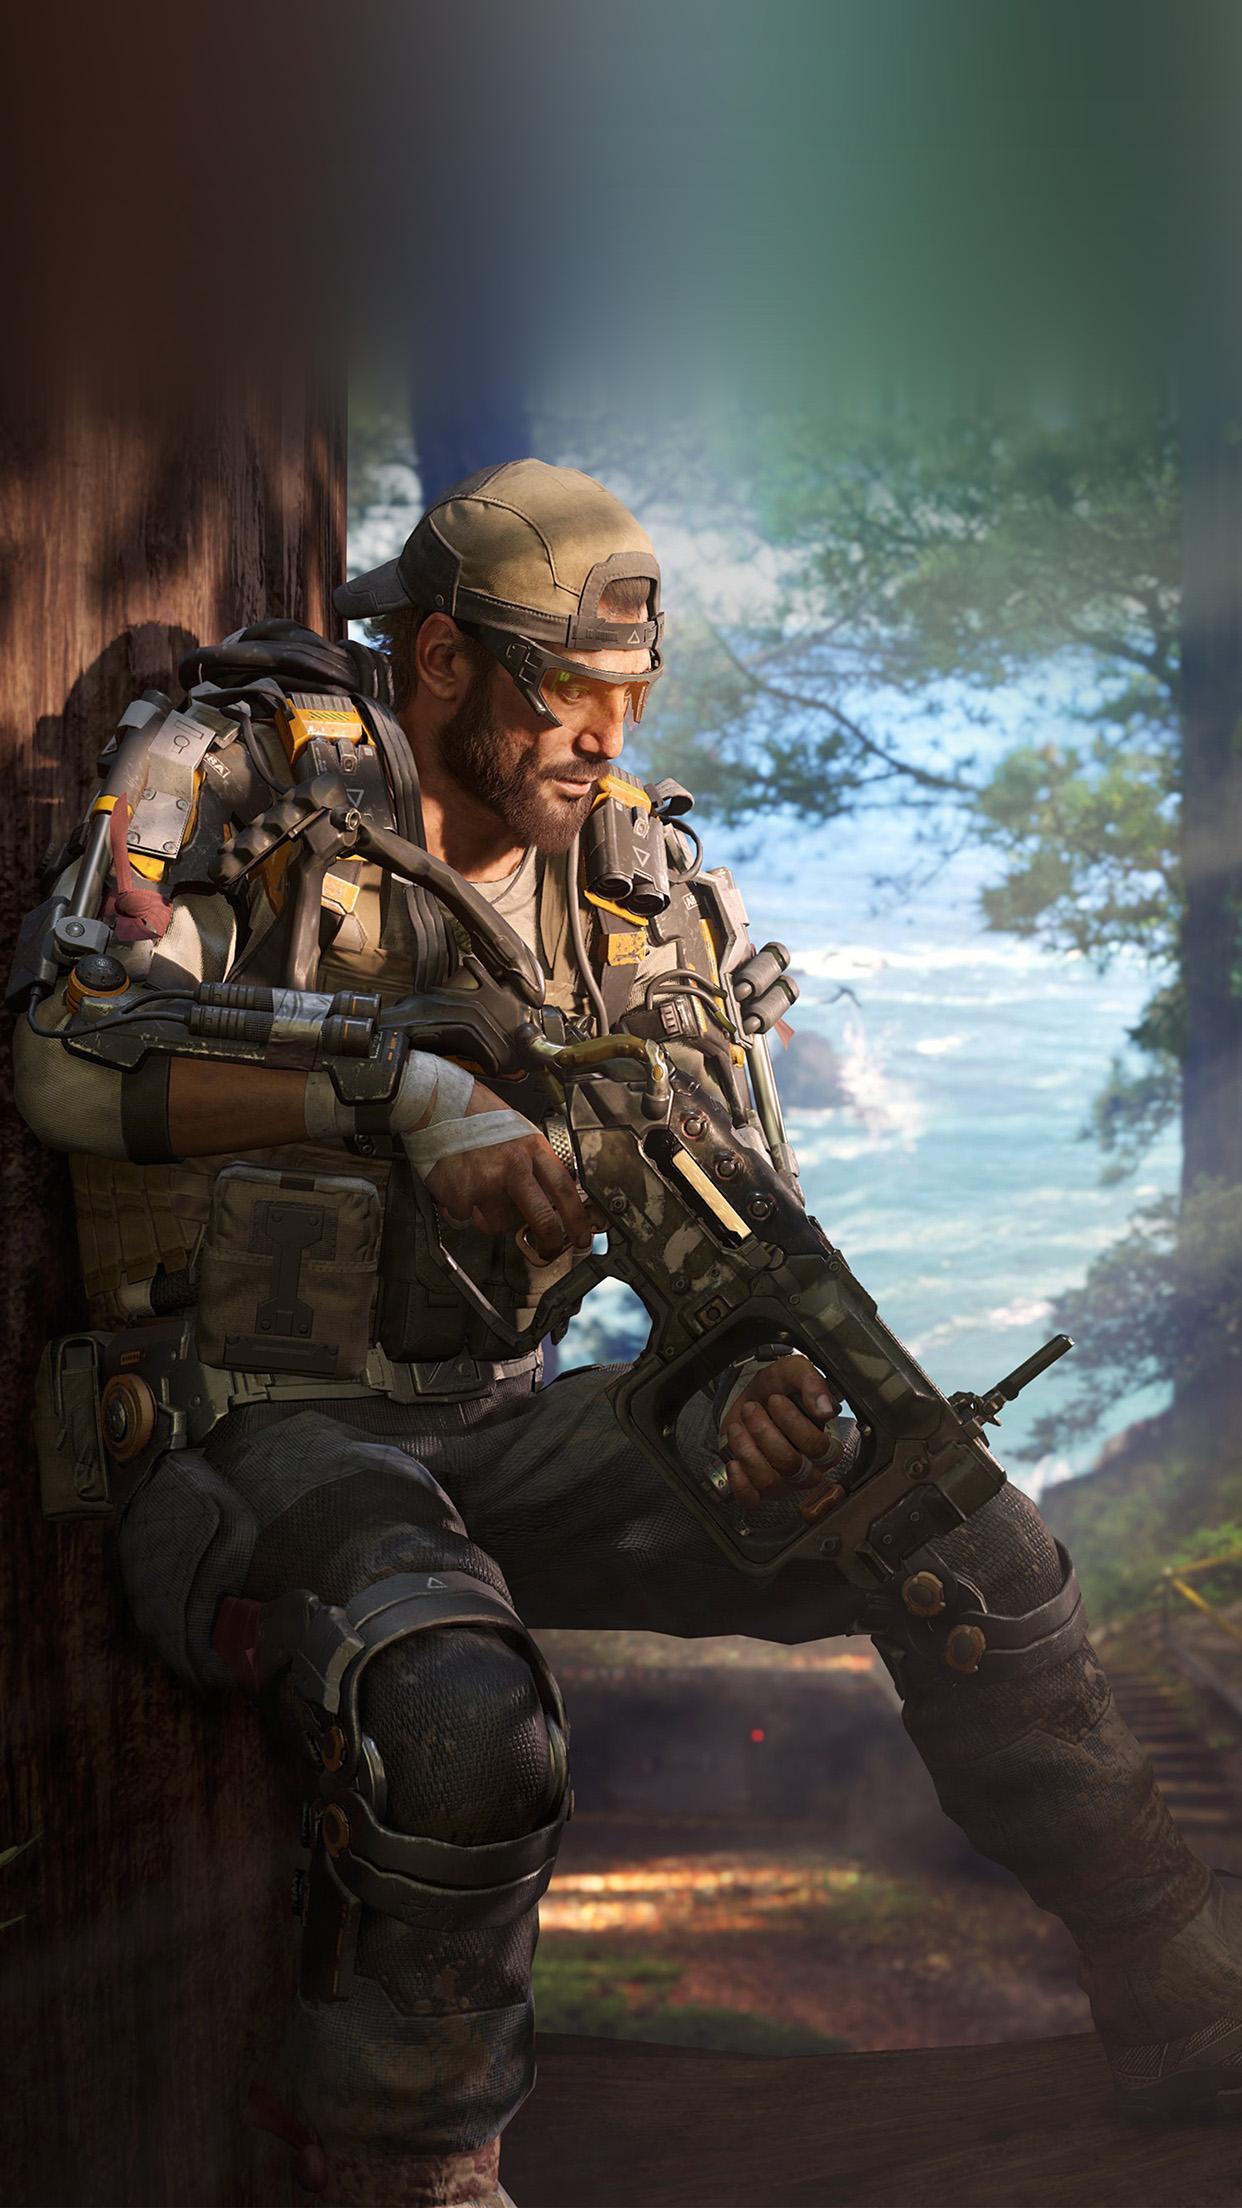 Air Anime Wallpaper Ar05 Call Of Duty Blackops Game Illustration Art Wallpaper